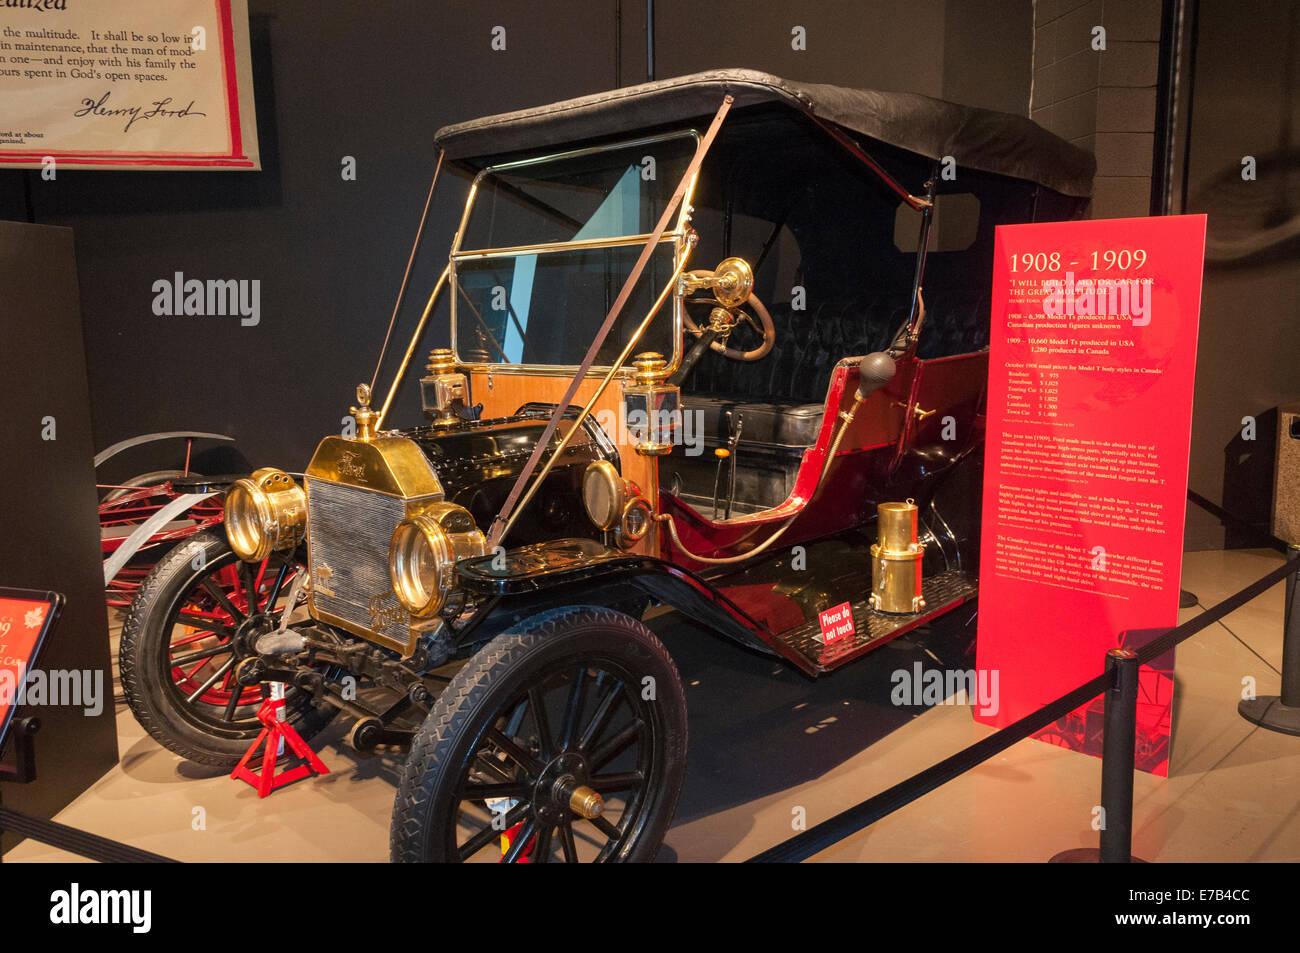 Elk203-5685 Canada, Alberta, Wetaskiwin, Reynolds-Alberta Museum, vintage automobile - Stock Image